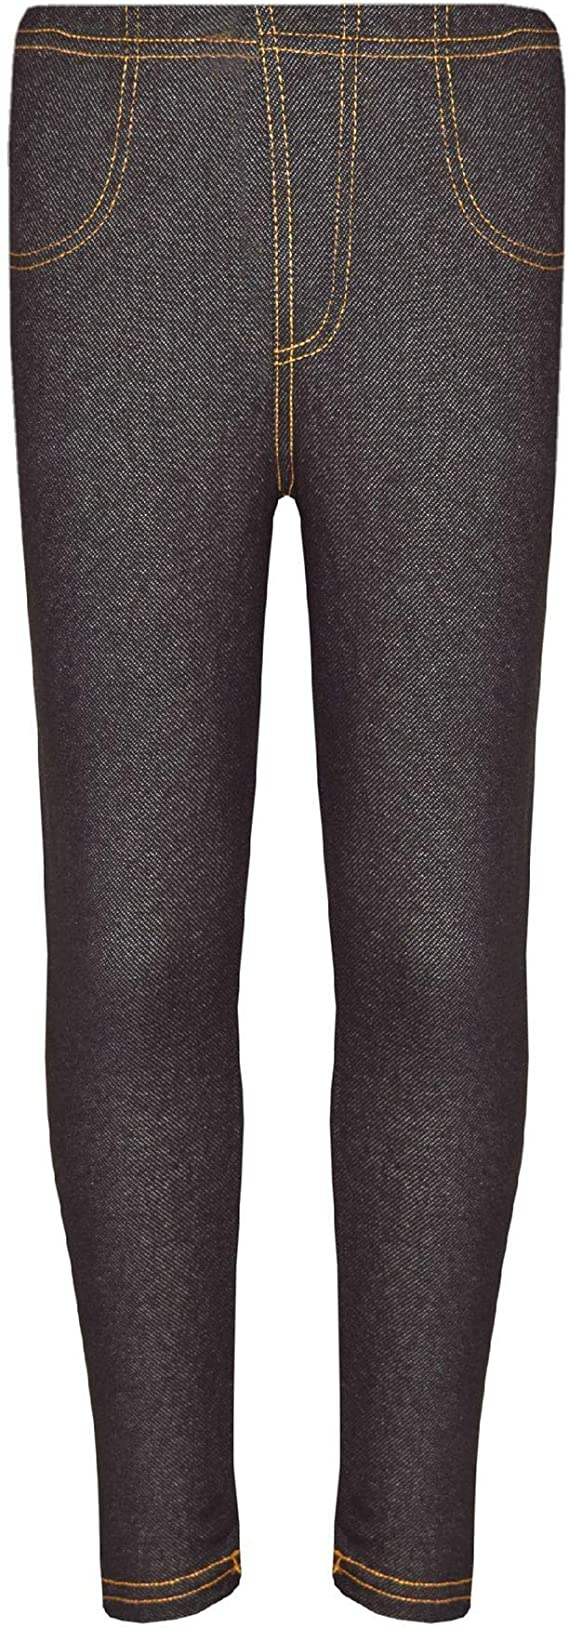 A2Z 4 Kids/® Kids Stretchy Jeans Girls Denim Stylish Jeggings Pants Fashion Trousers Leggings Age 5 6 7 8 9 10 11 12 13 Years